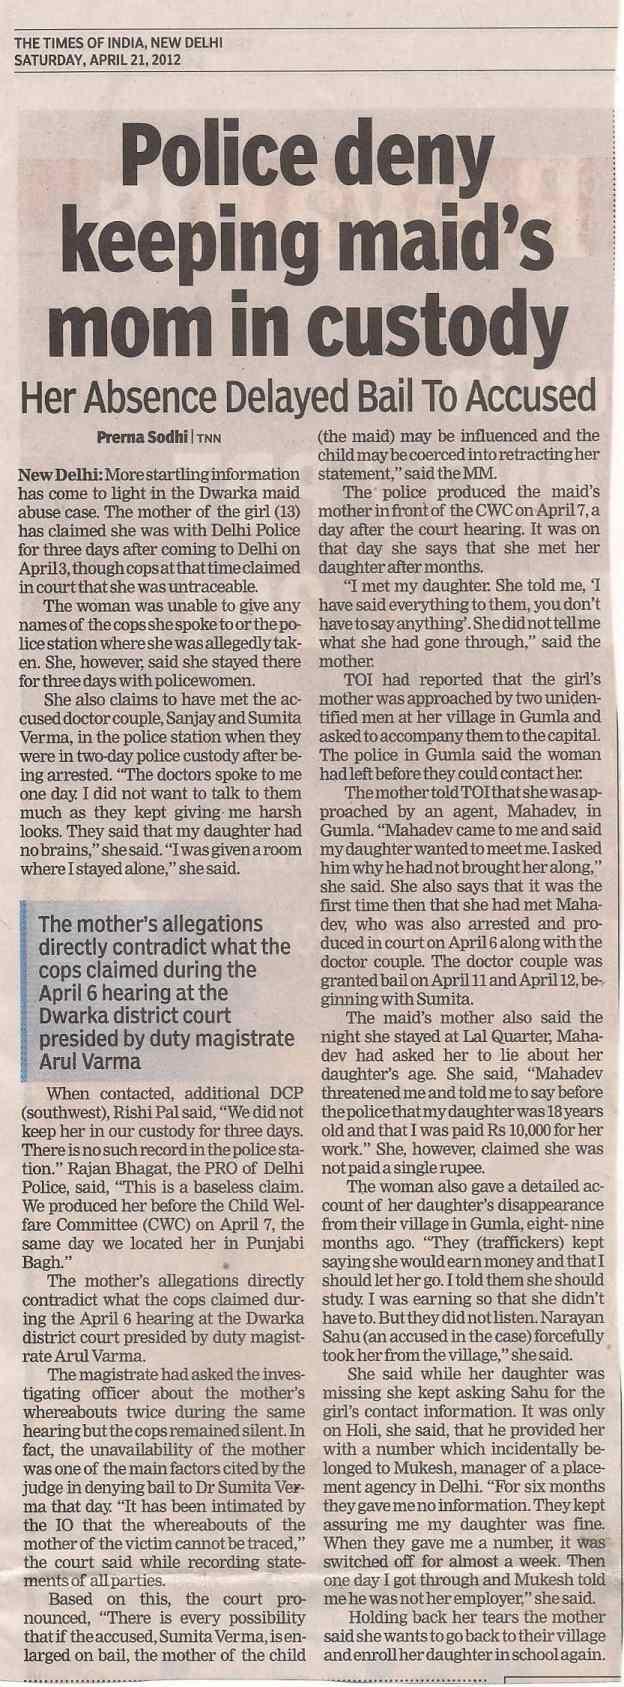 Police deny keeping maids mom in custody